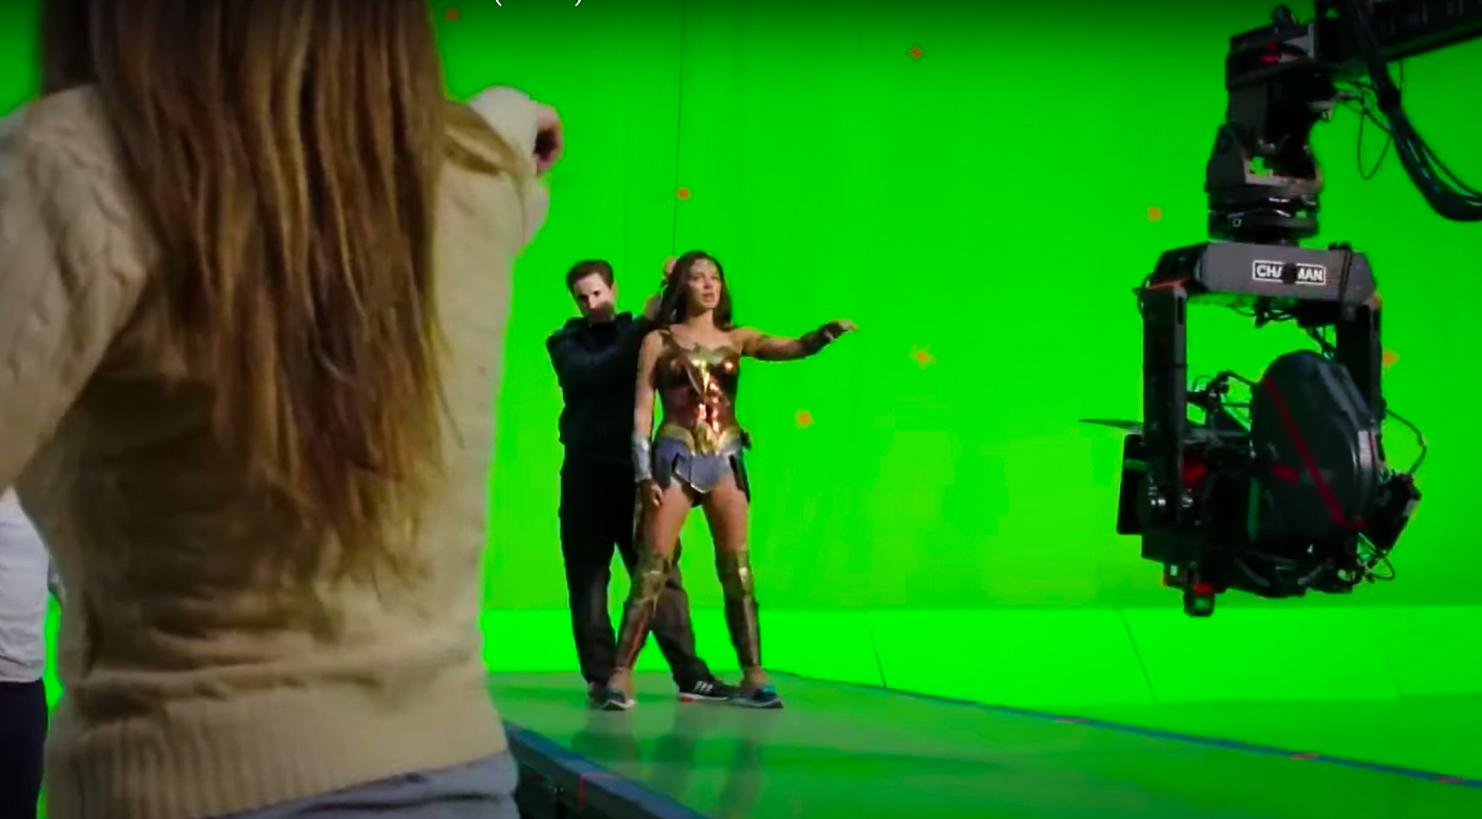 MG Action, Martin Goeres, Wonder Woman, Gale Gadot, Stunt Rigging, Deutschland